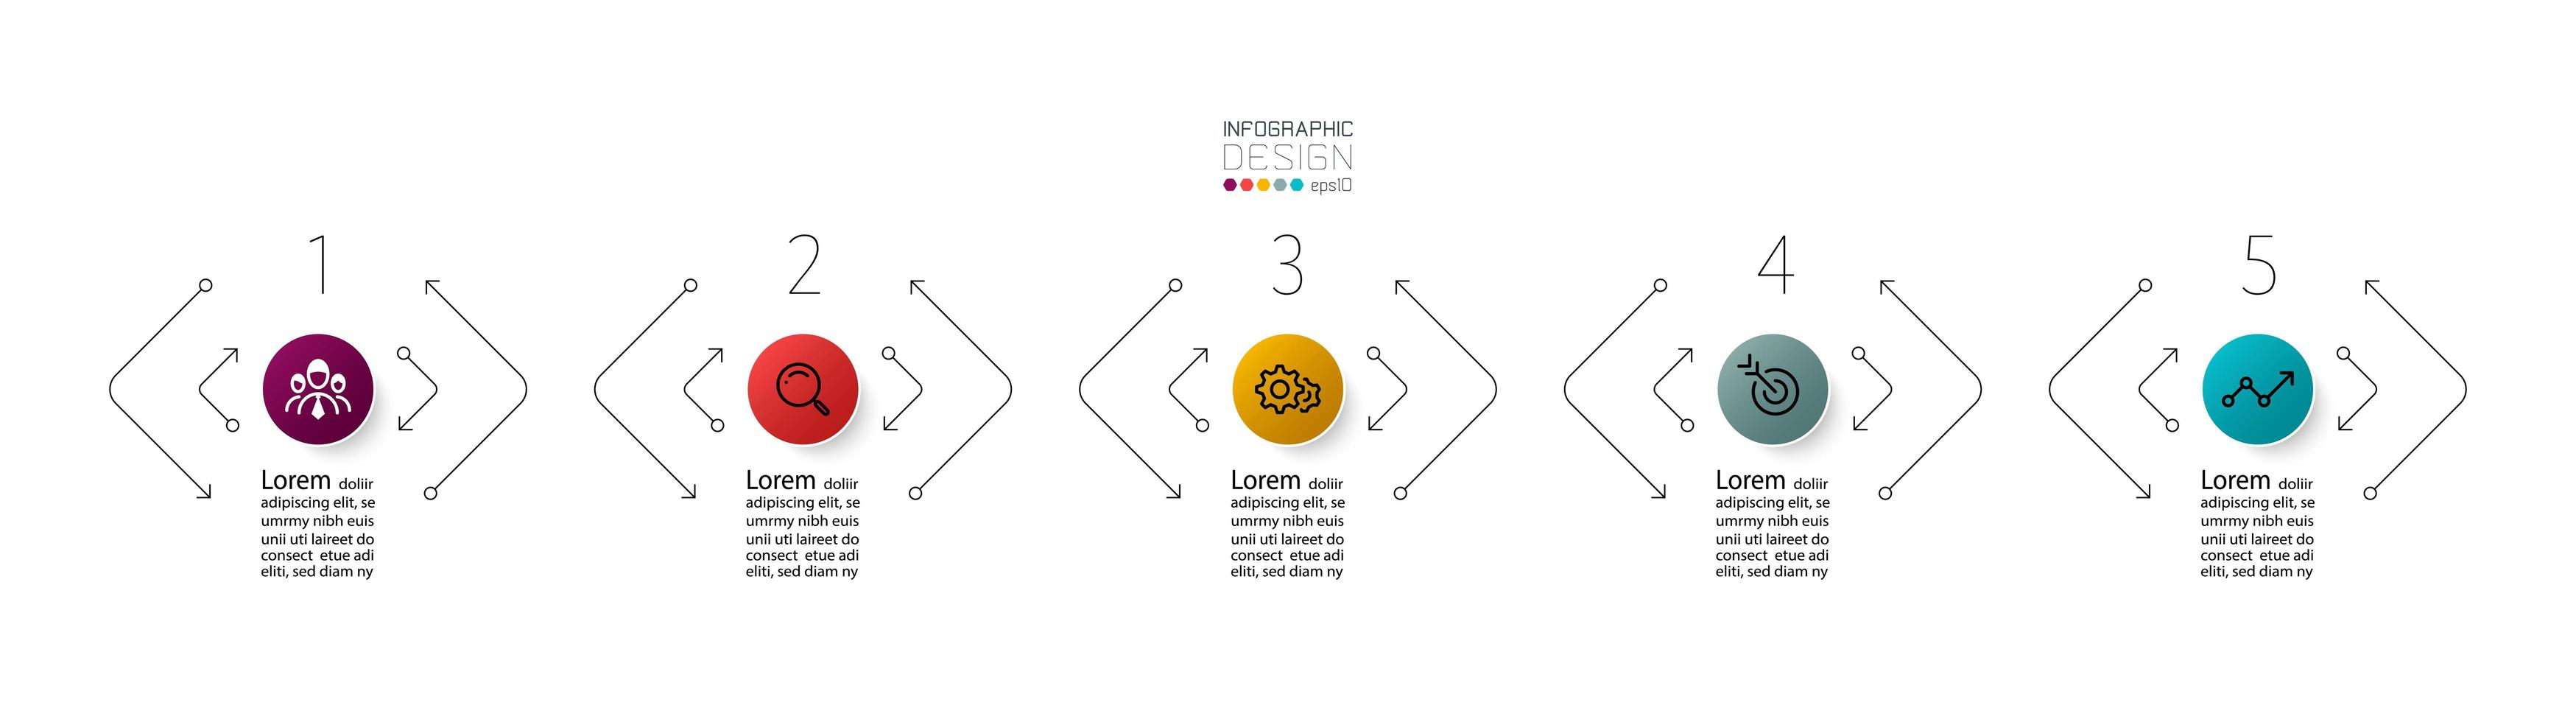 plan d'options en cinq étapes vecteur